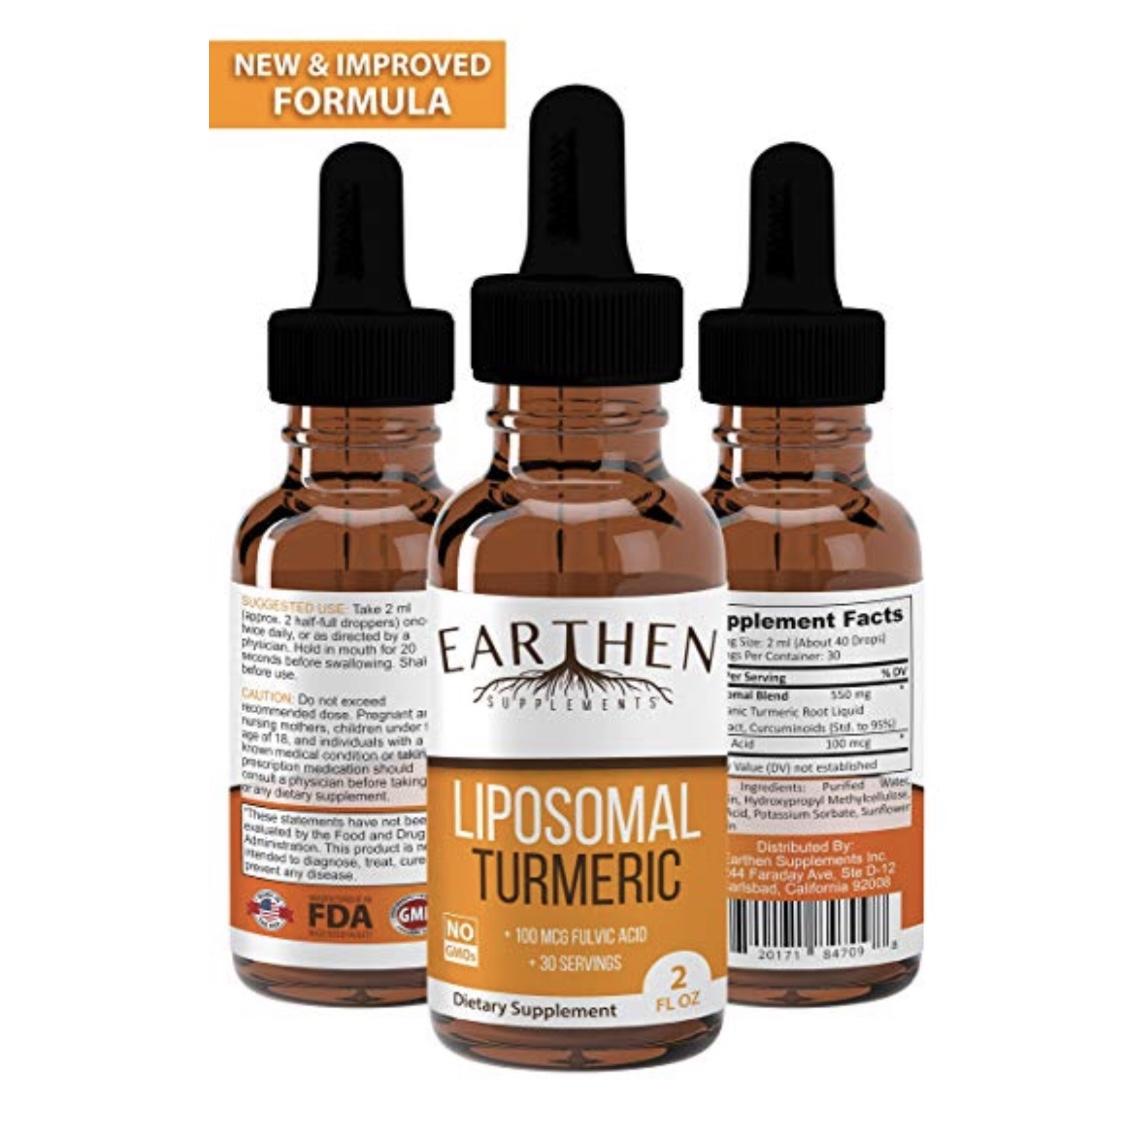 EARTHEN Organic Liposomal Turmeric - Liquid, liposomal turmeric with added fulvic acid means fast, maximum absorption and bioavailability